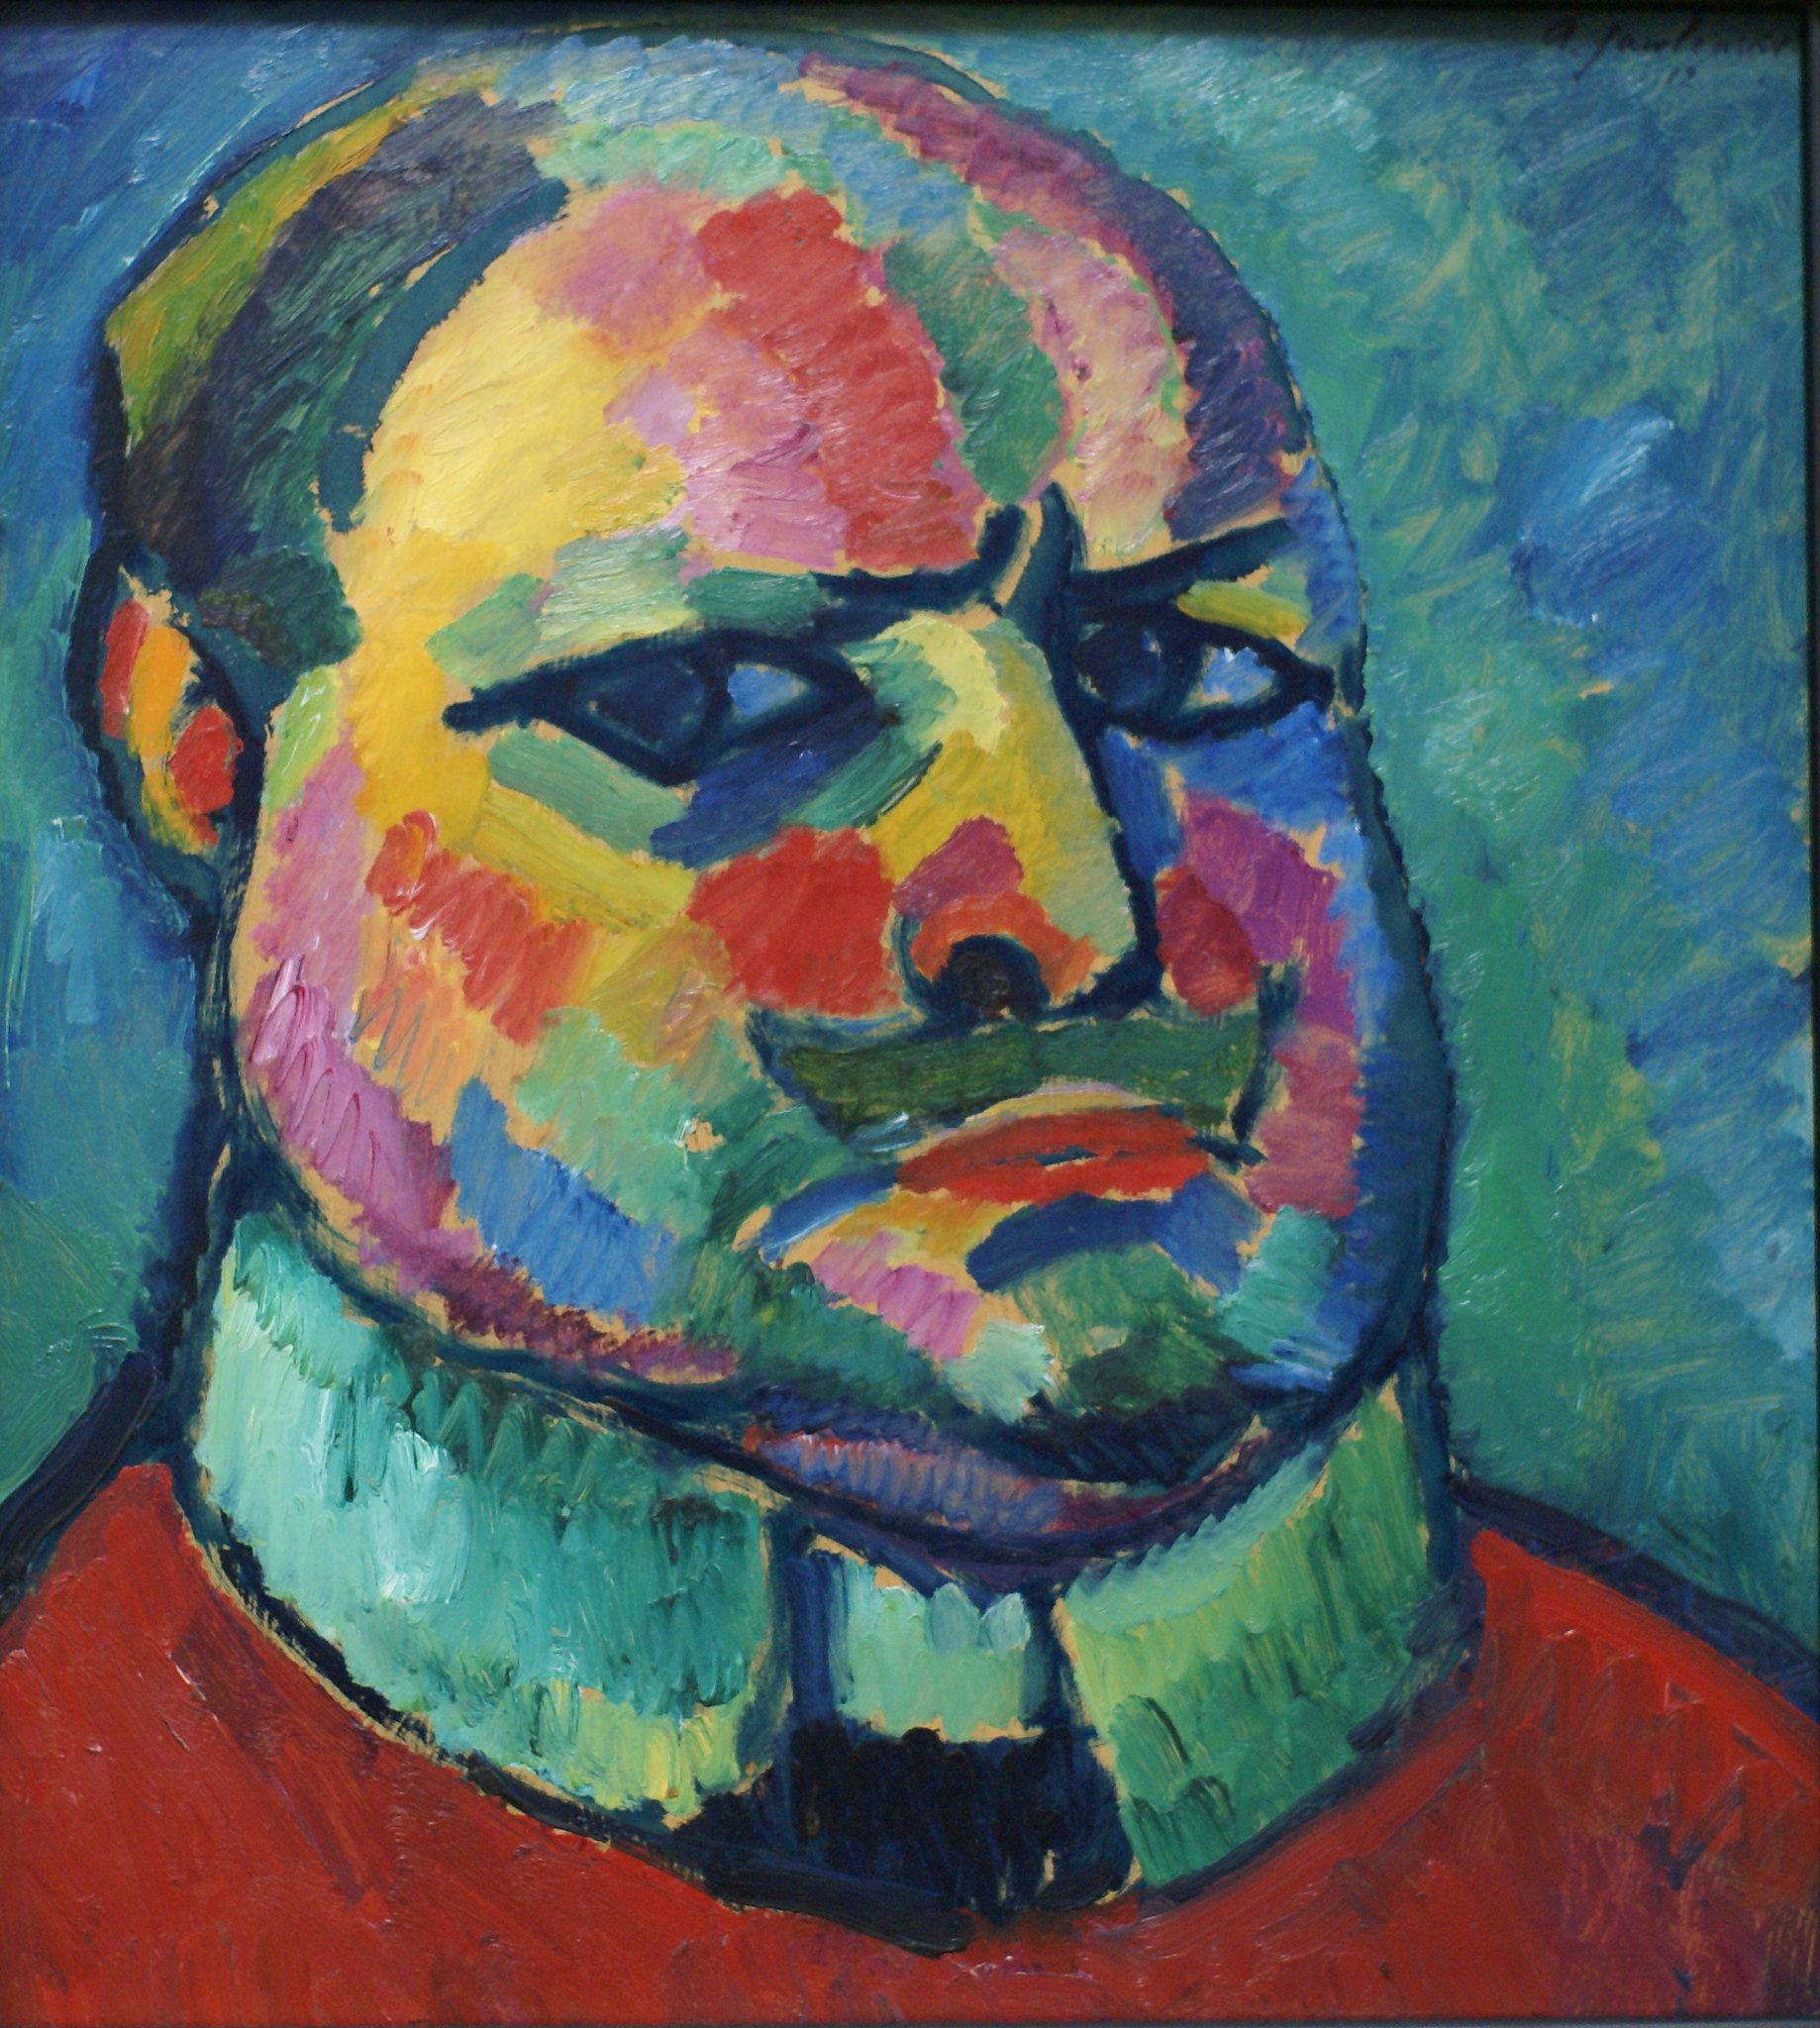 Alexej Von Jawlensky Selbstbildnis Selfportrait In 2020 Art Painting Oil Expressionist Painting Painting